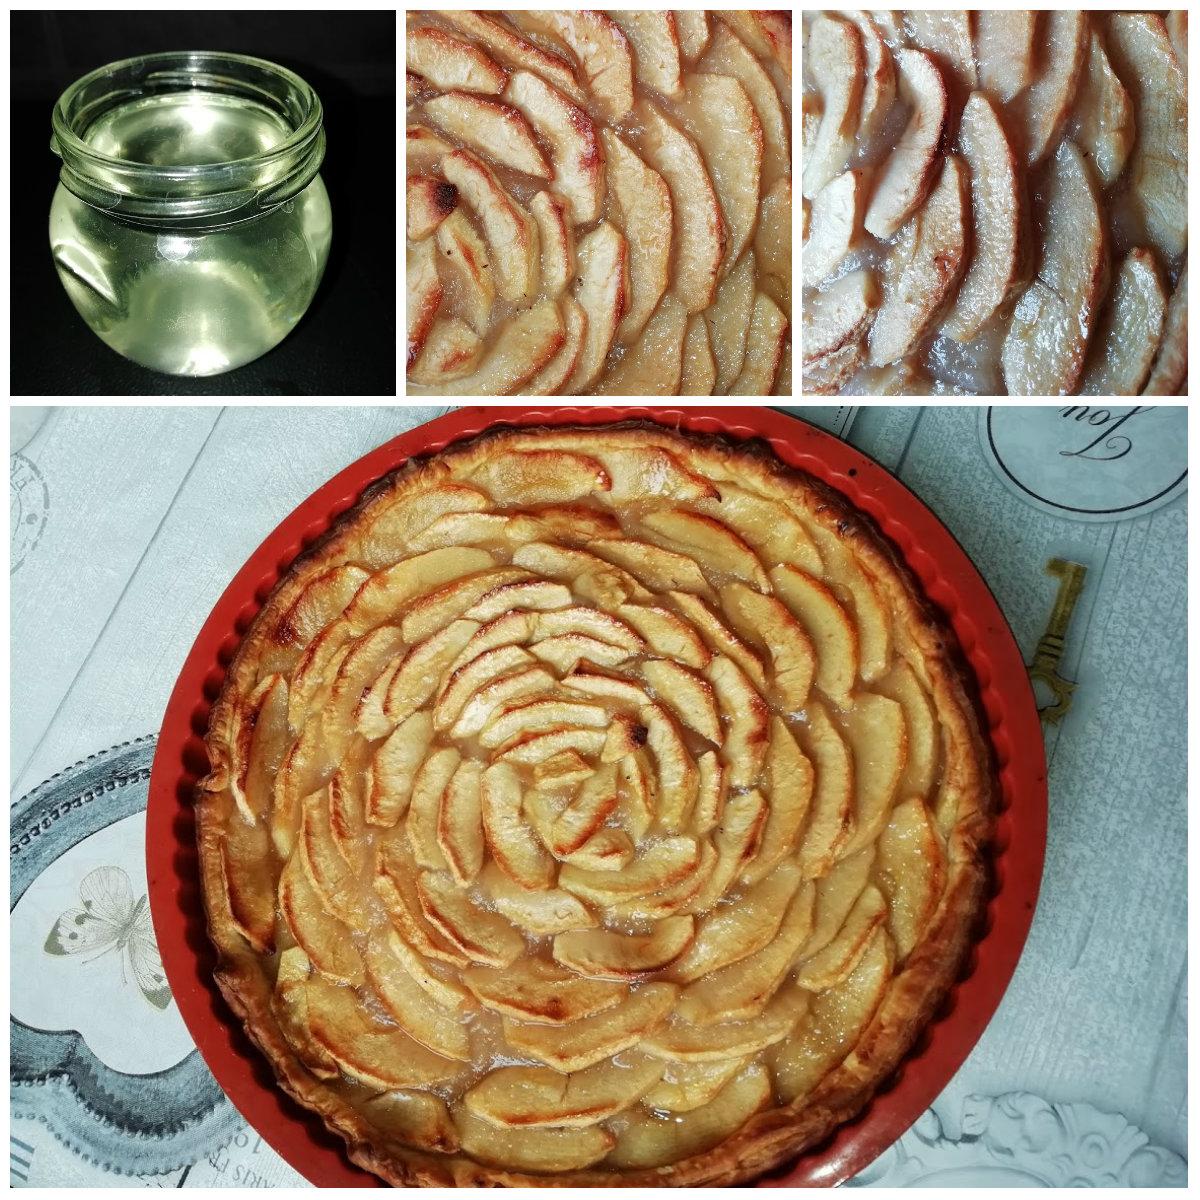 tarte aux pomme nappage